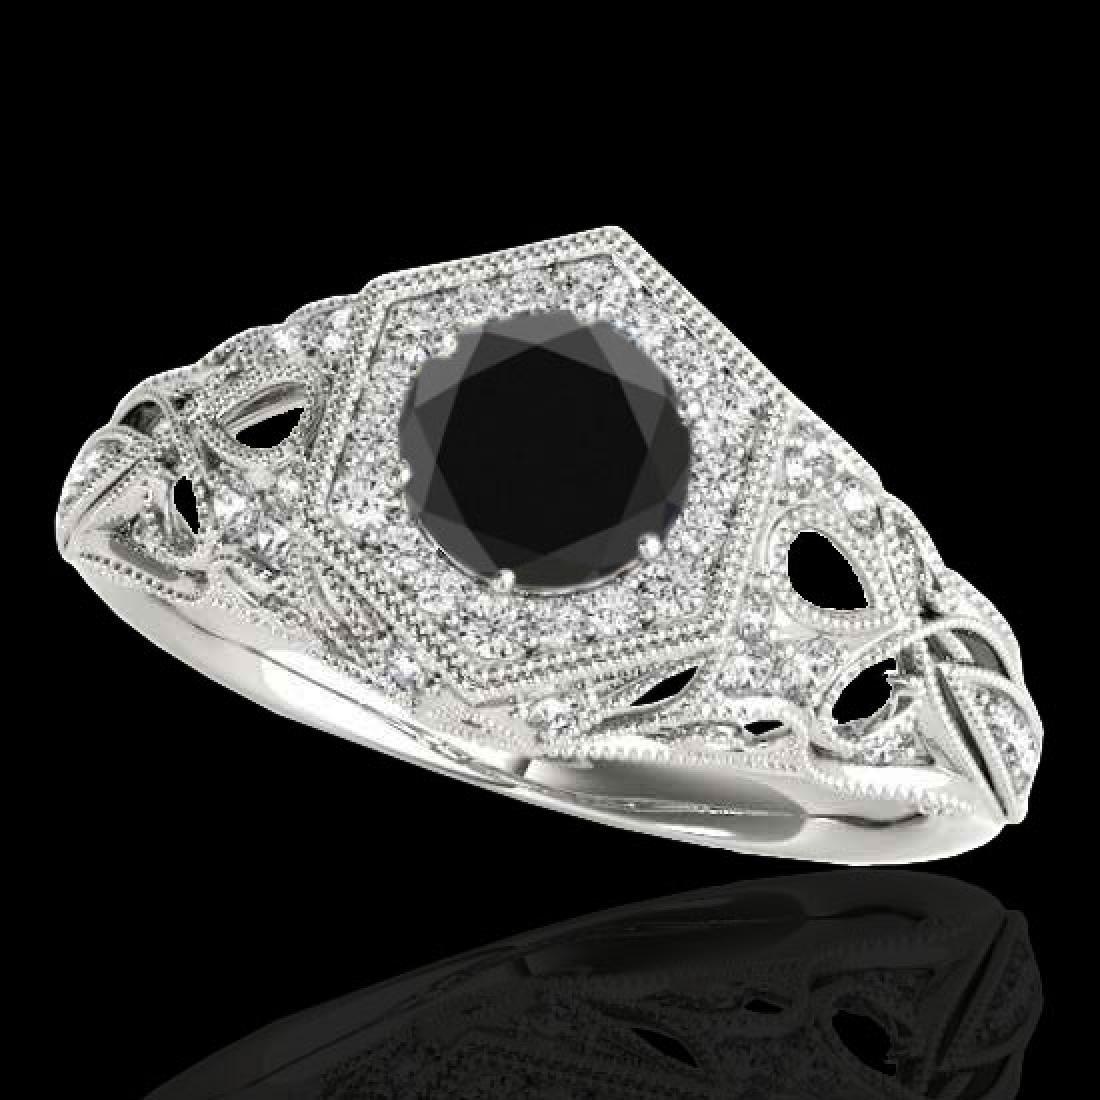 1.4 CTW Certified VS Black Diamond Solitaire Antique